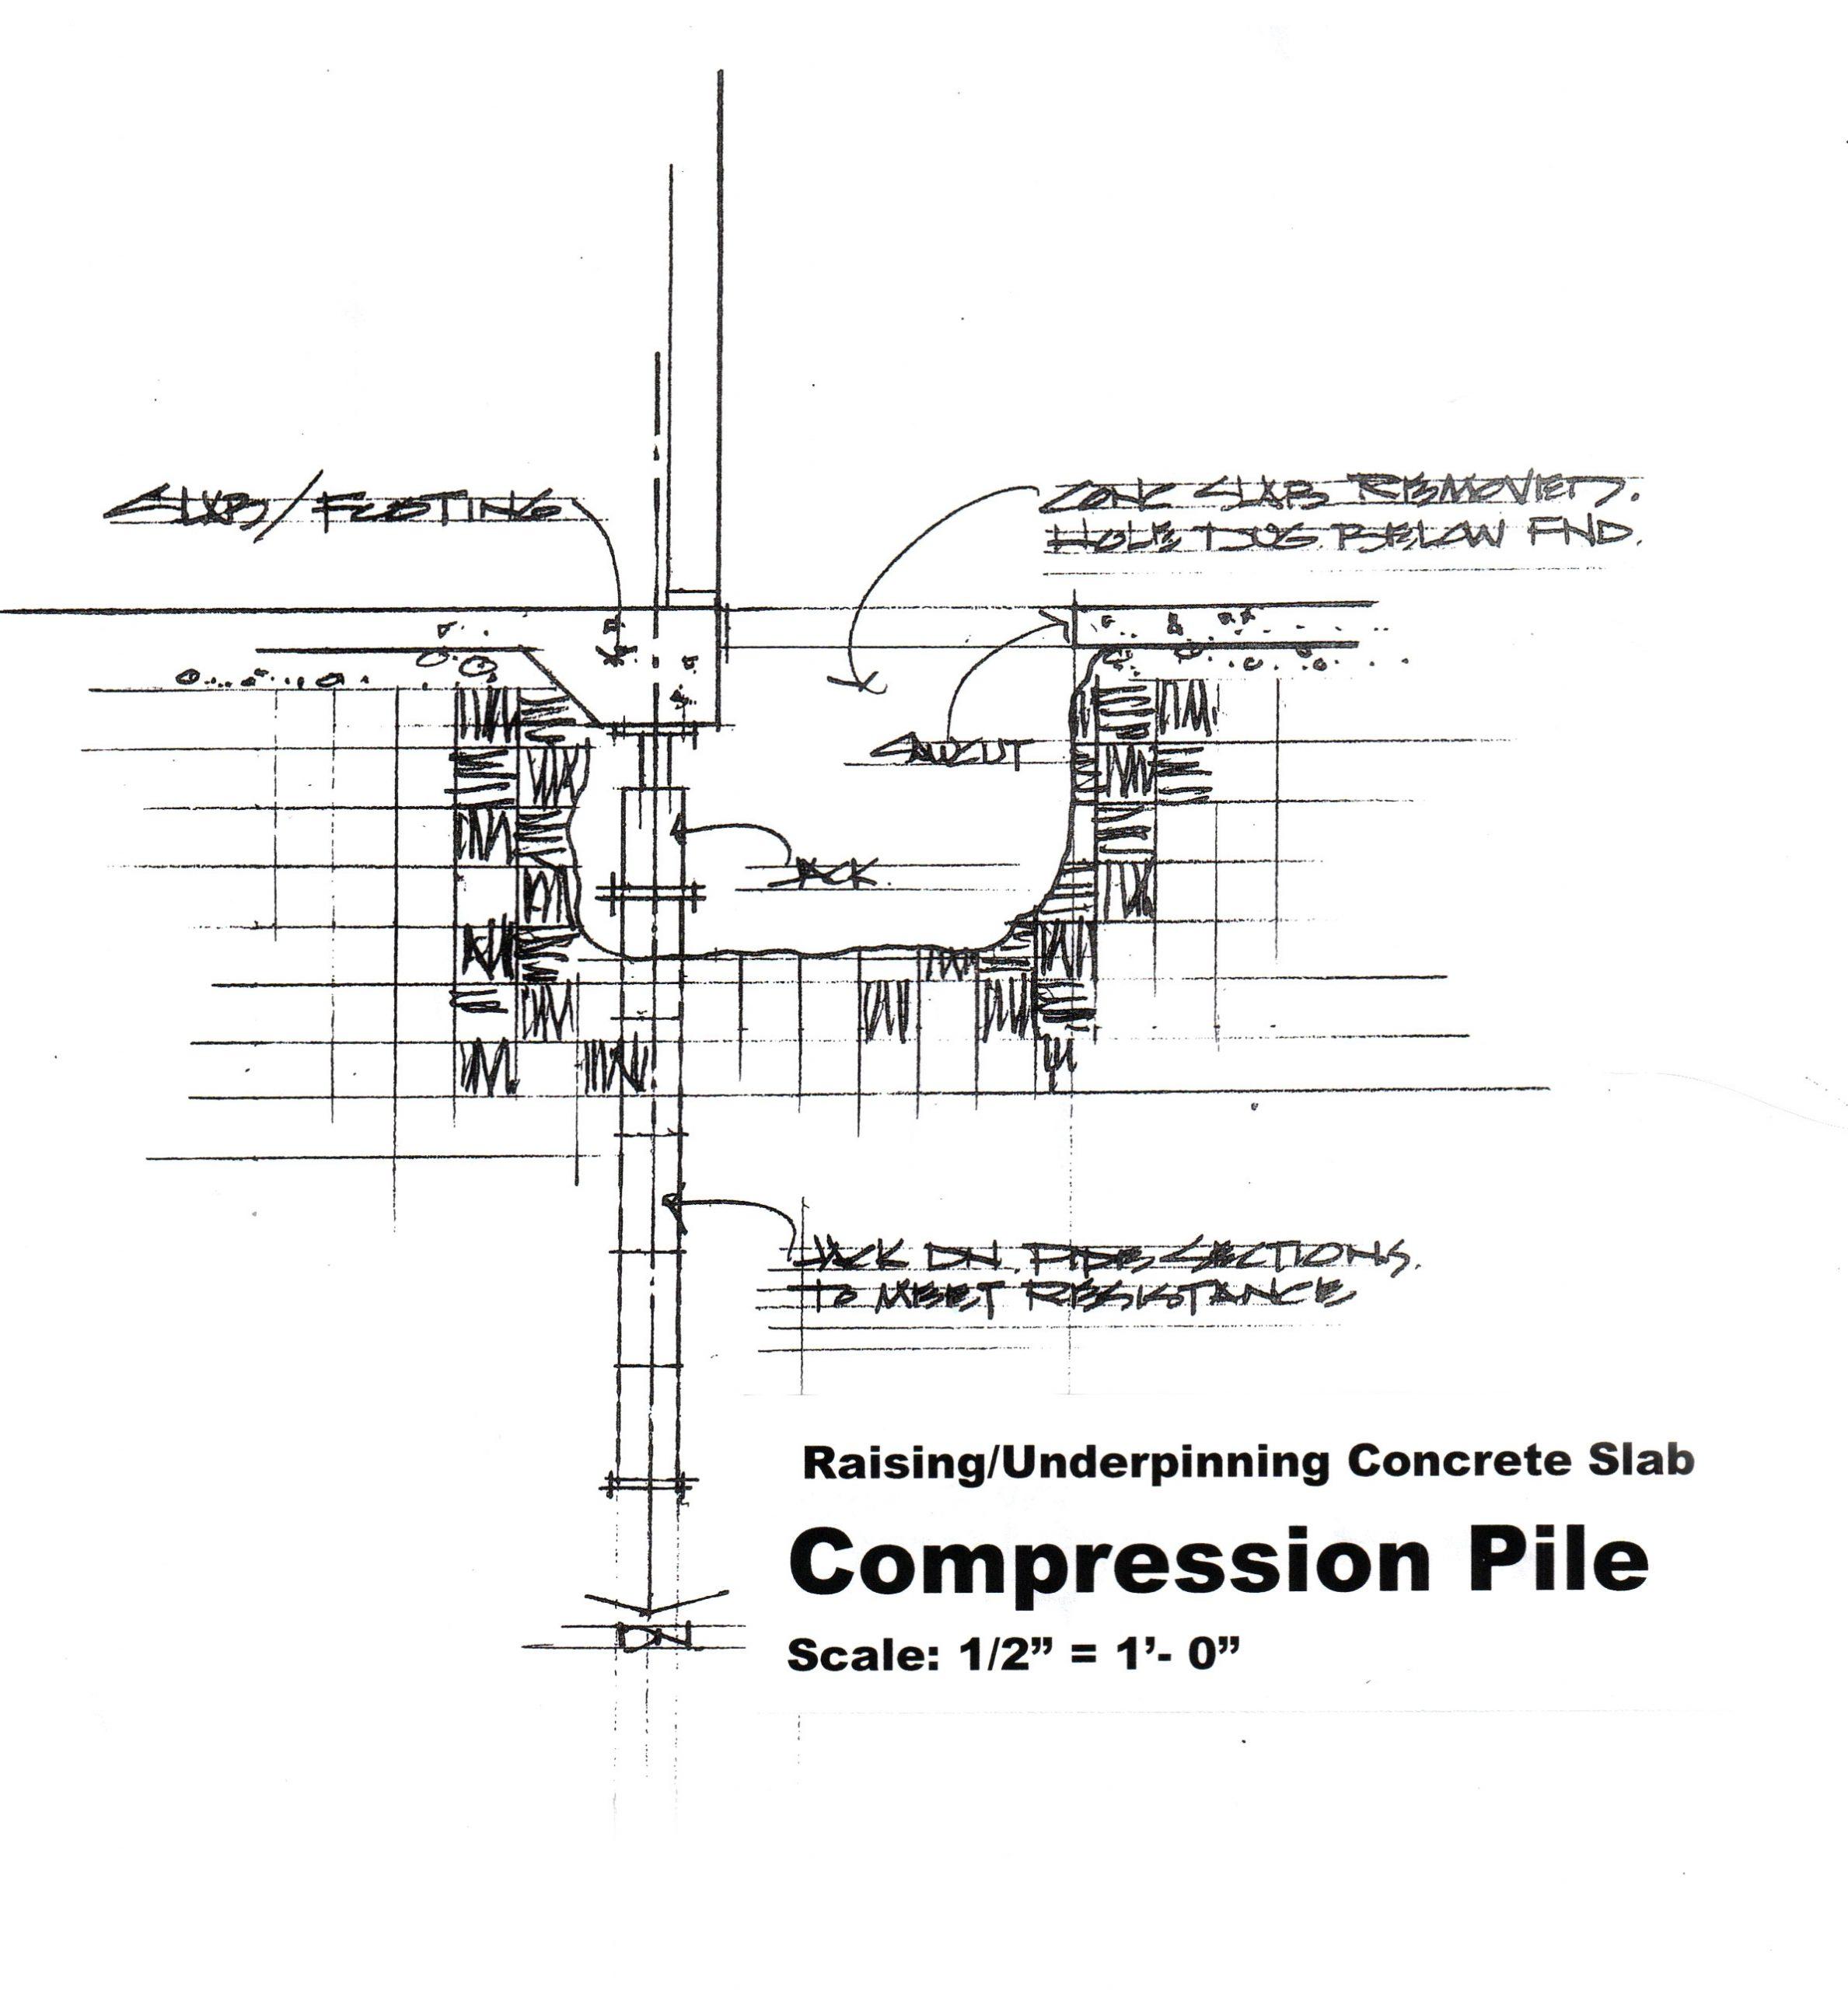 compression pile raising underpinning concrete slab